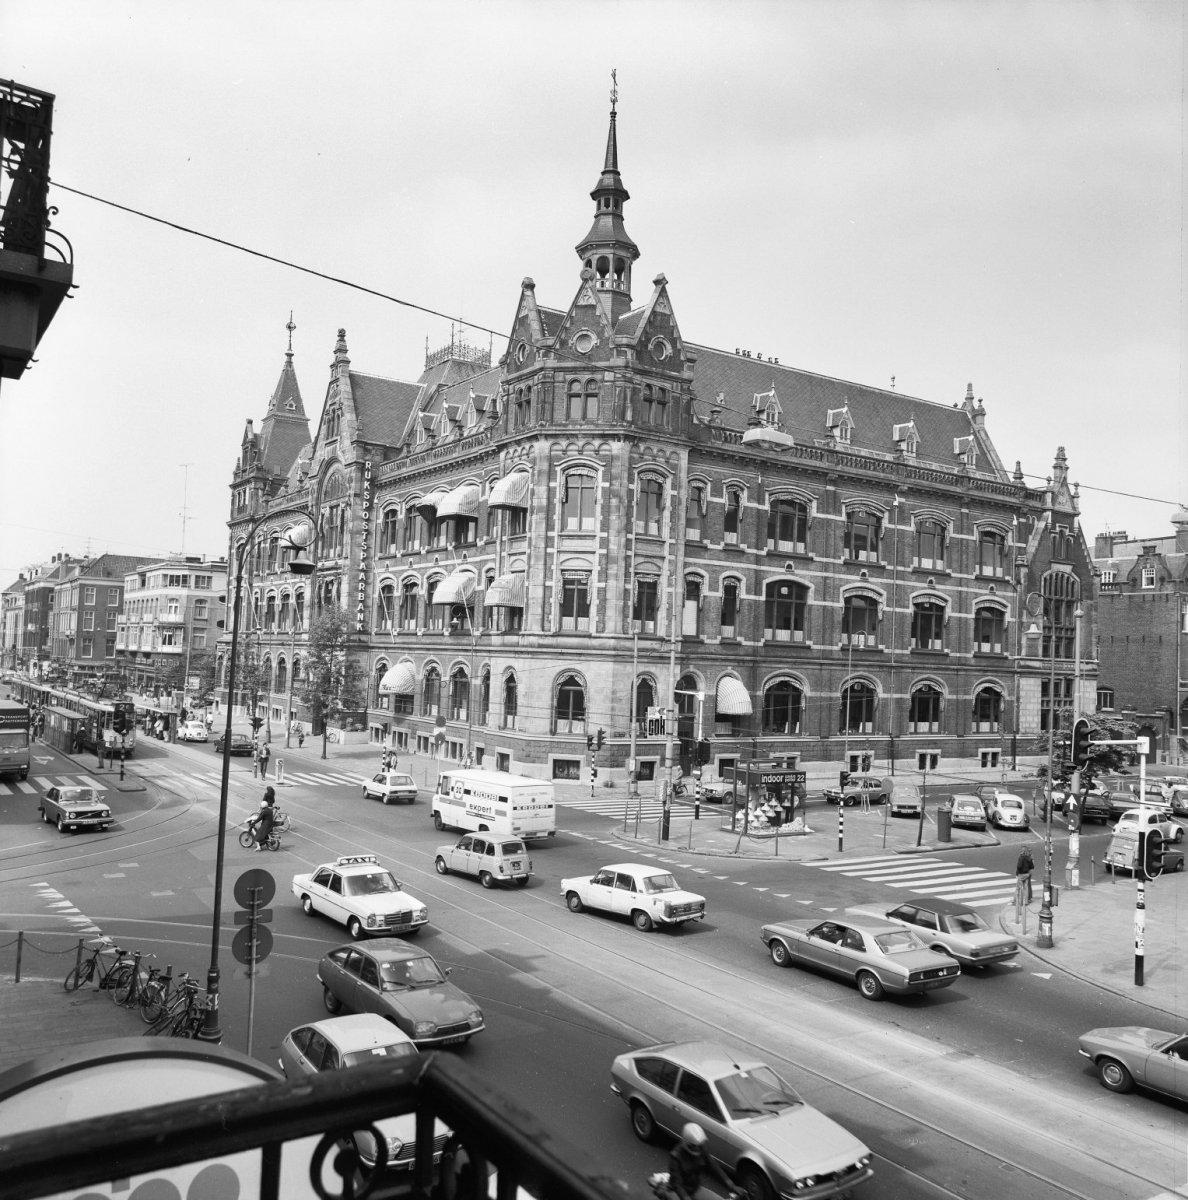 Conservatorium Hotel Van Baerlestraat Oud Zuid Amsterdam